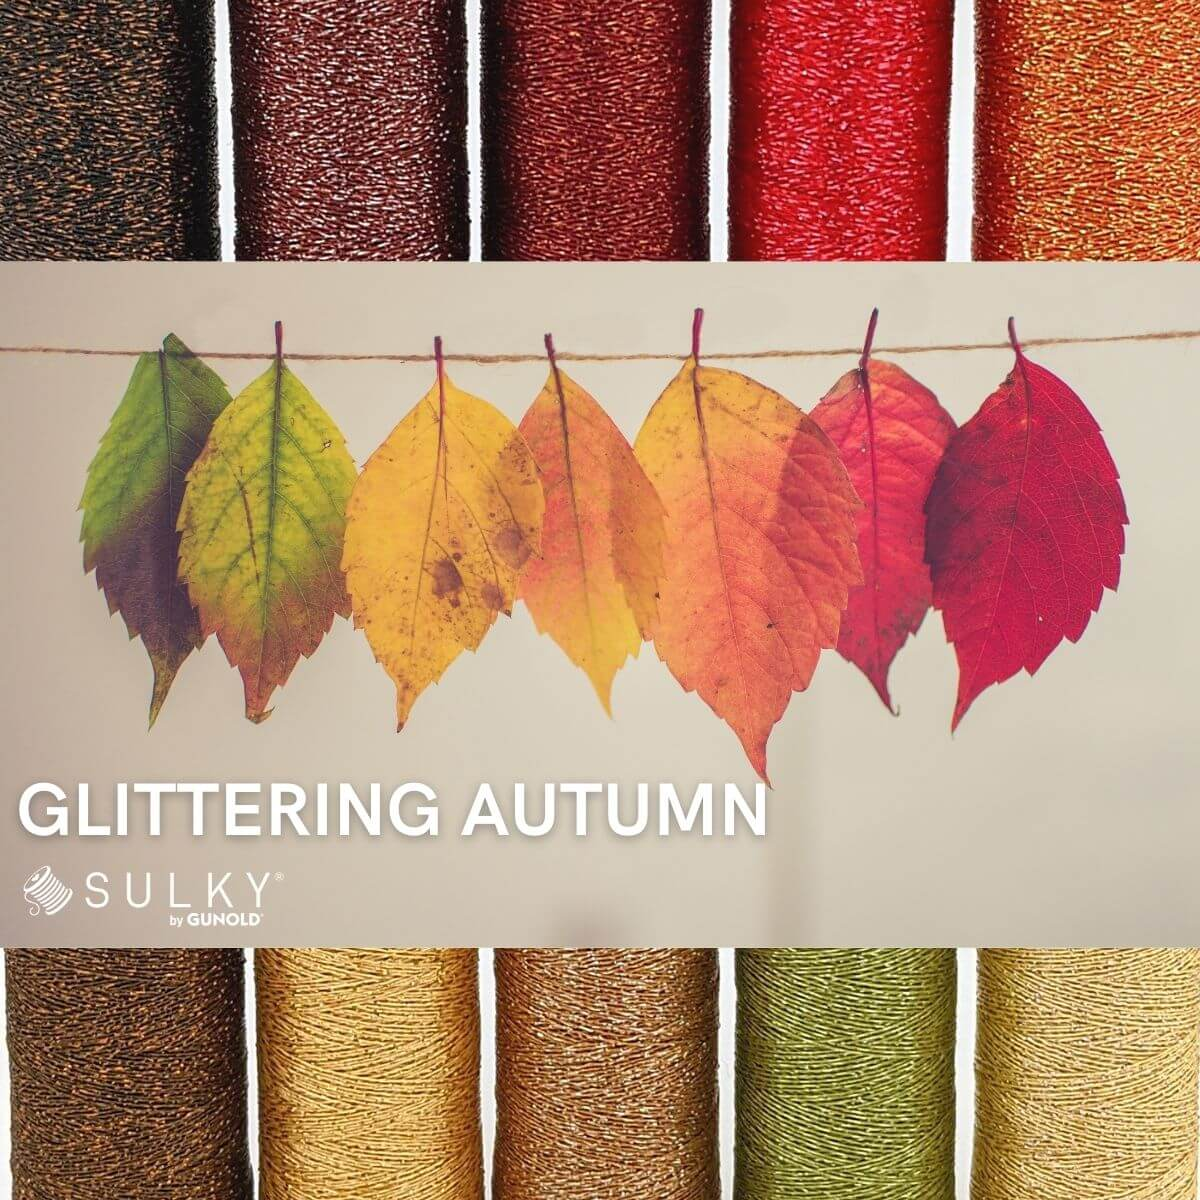 SULKY POLY SPARKLE 30 - Glittering Autumn (10 x 265m Snap Spulen)